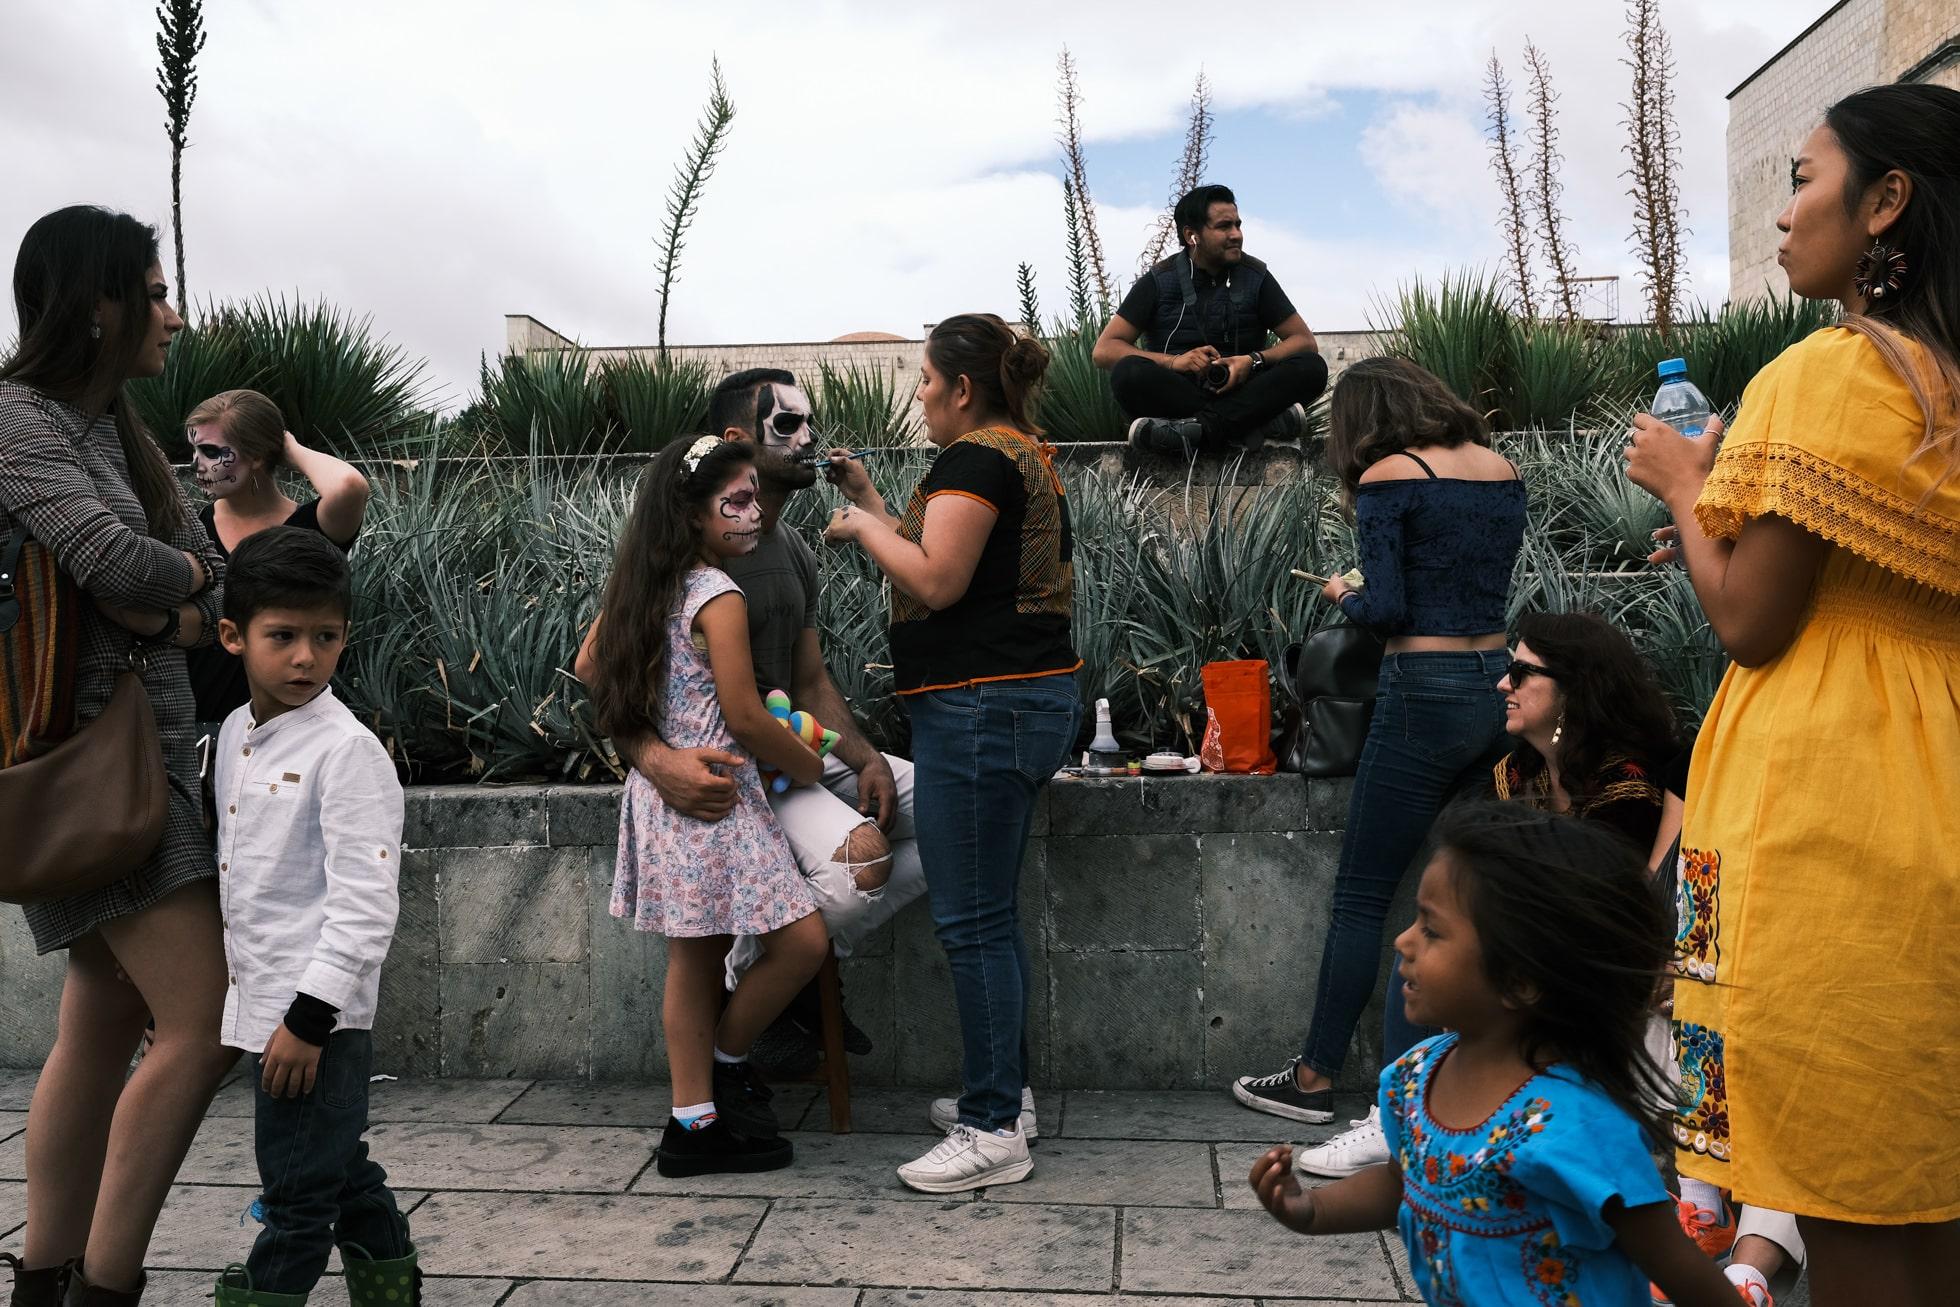 fujifilm-x-pro3-mexico-street-photography-23